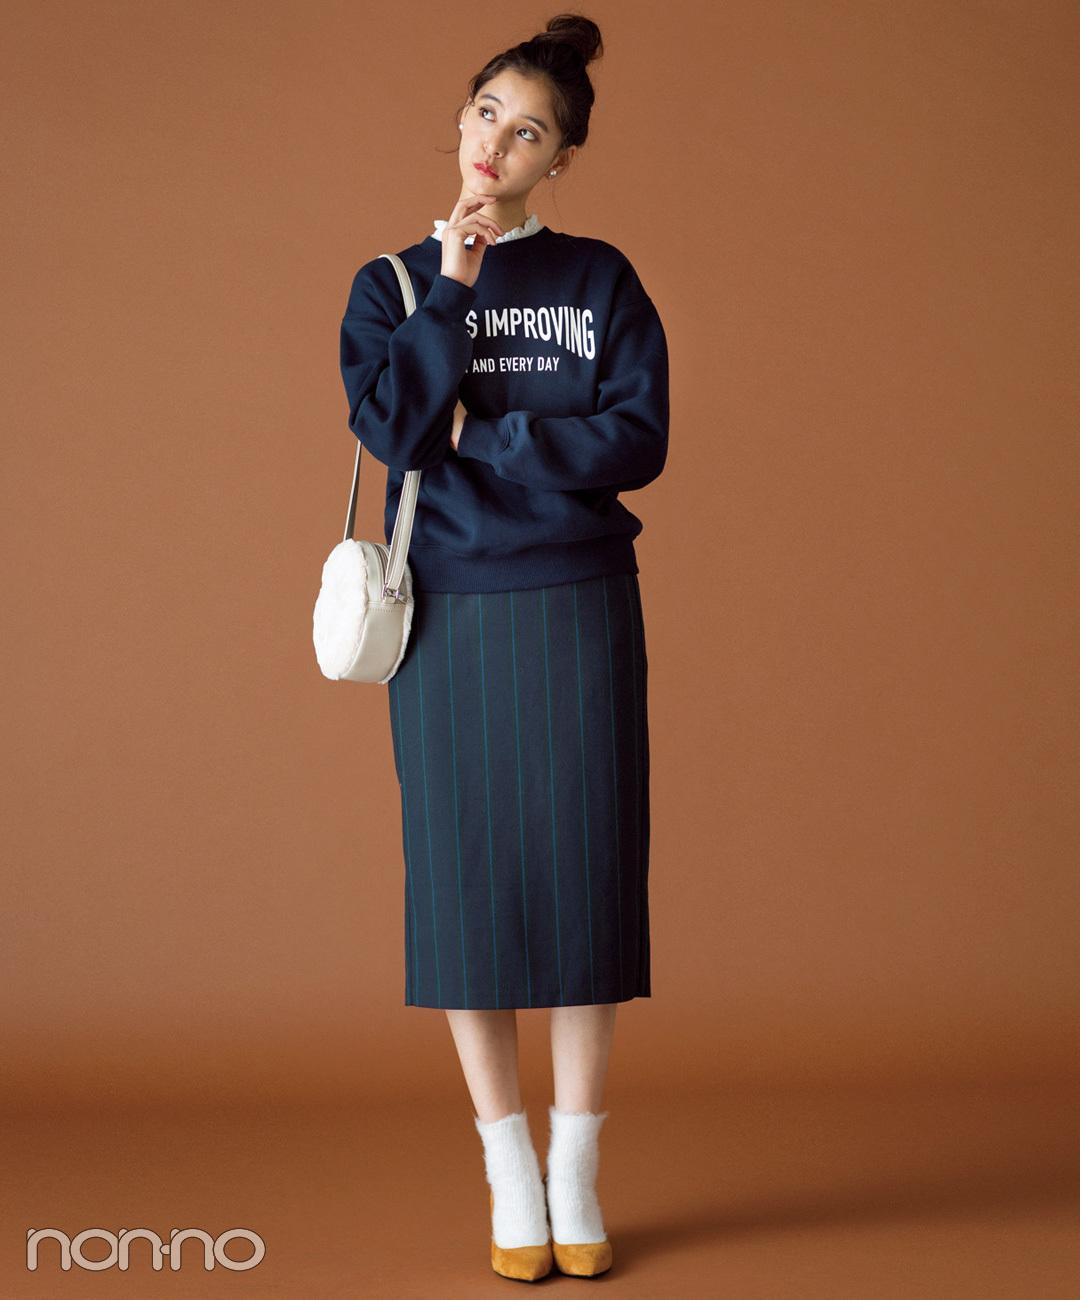 【GUのタイトスカート】プレッピーに転ばせて知的なグッドガール風♡